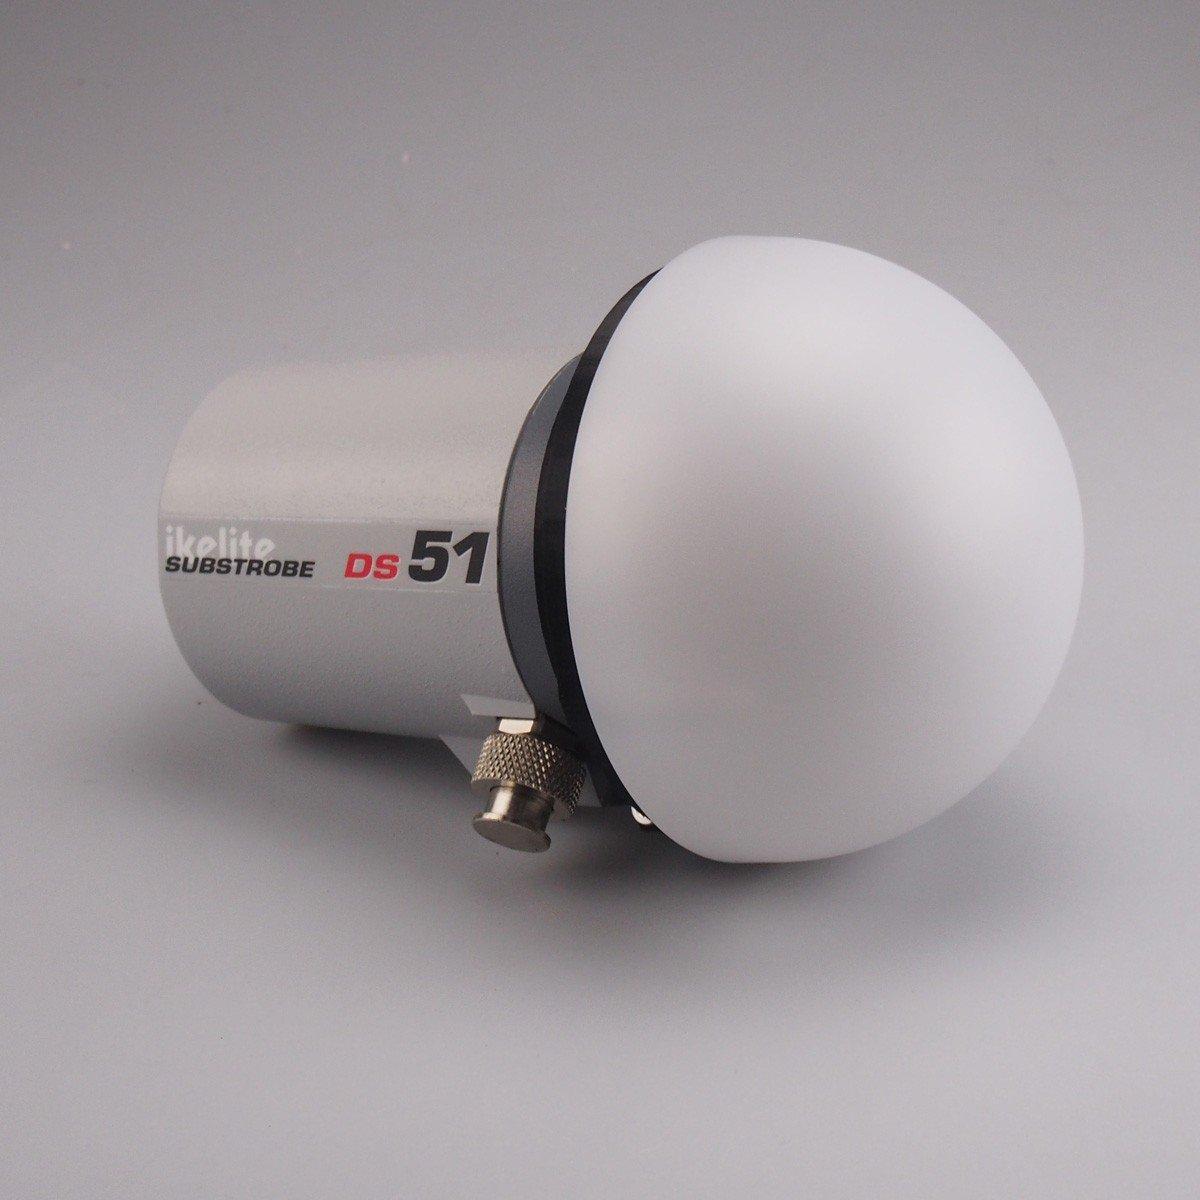 Dome Diffuser Pro for Ikelite DS51 / DS50 / AF35 strobe